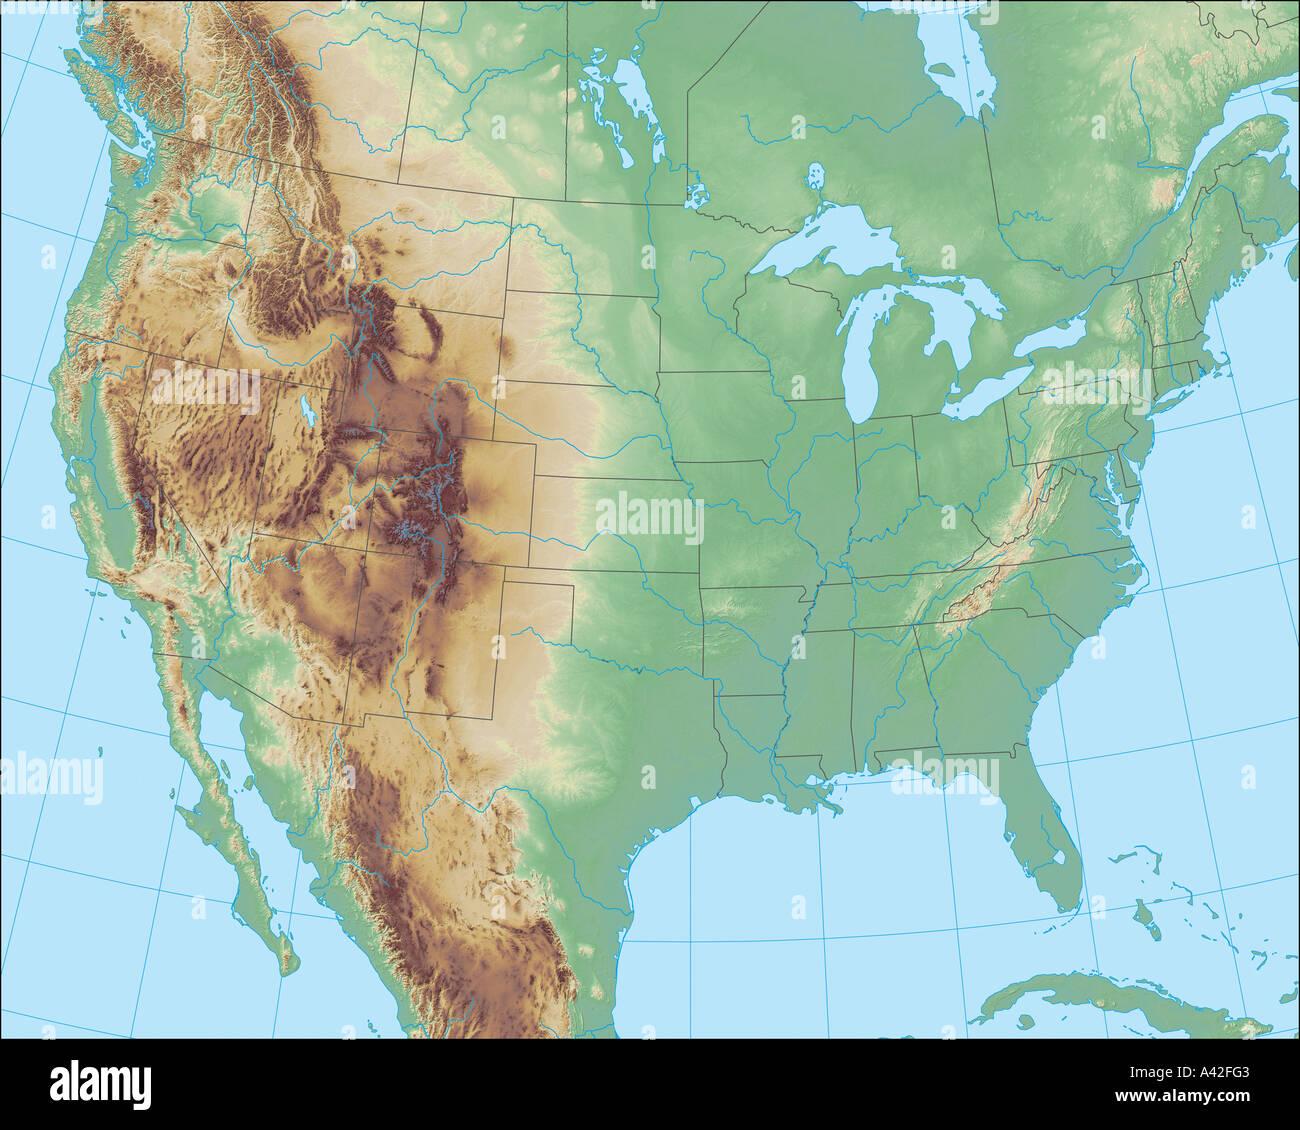 Beautiful but realistic terrain map of North